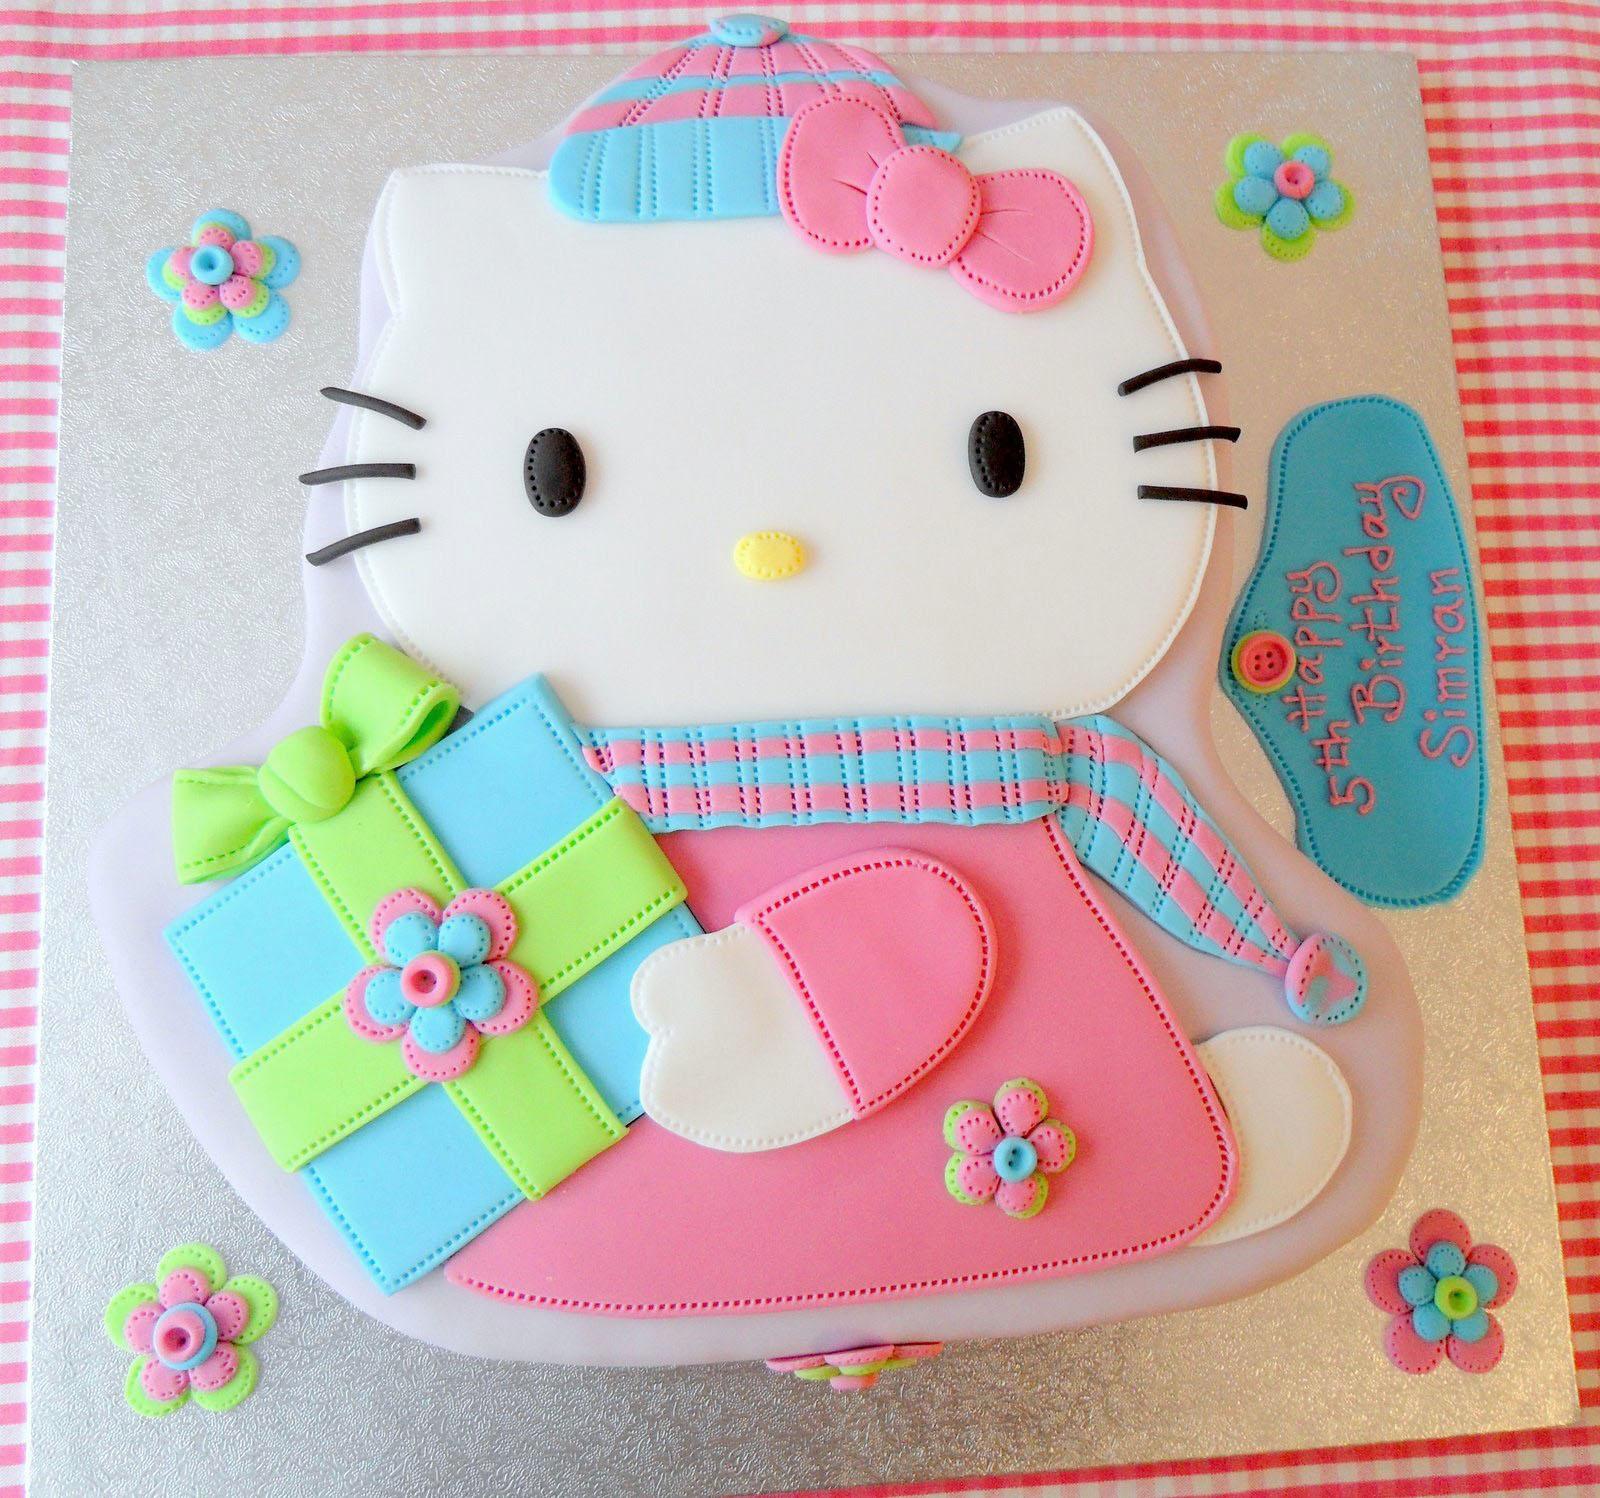 deborah hwang cakes how to make hello kitty cake